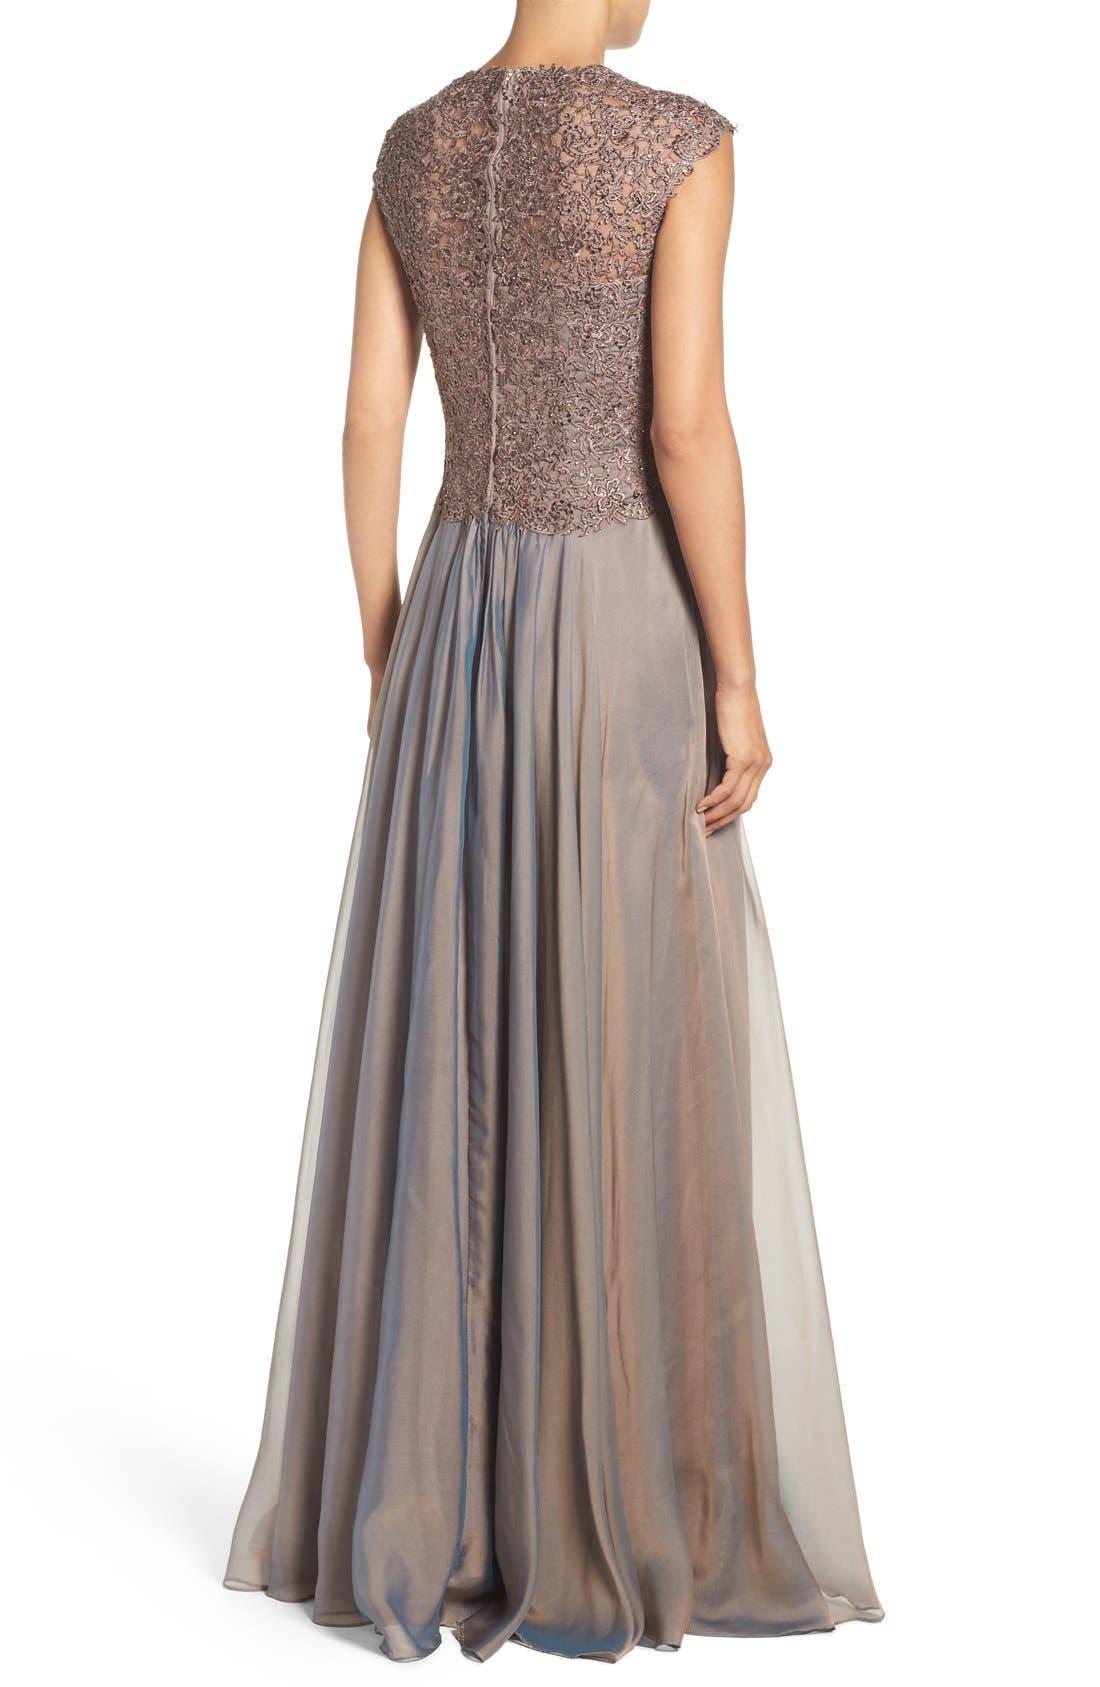 LA FEMME, Ruched Chiffon Gown, Alternate thumbnail 2, color, COCOA